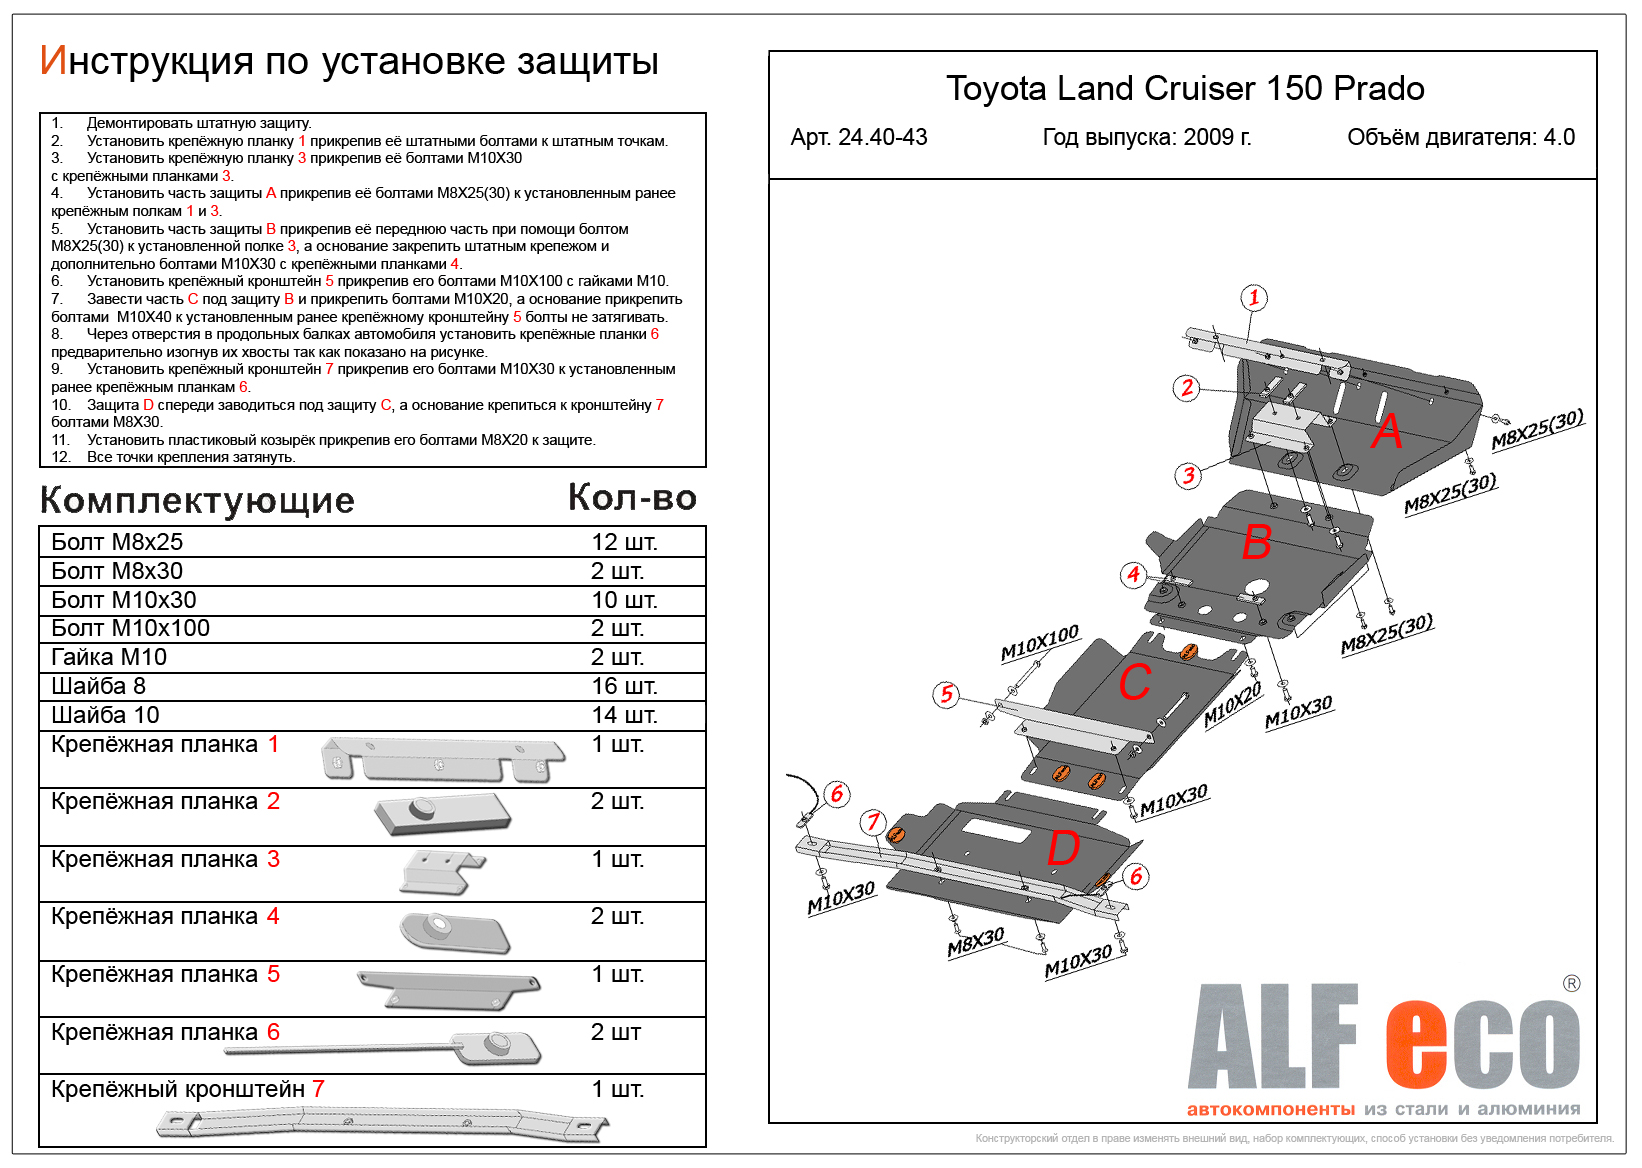 prado-tuning.ru - тюнинг toyota land cruiser prado